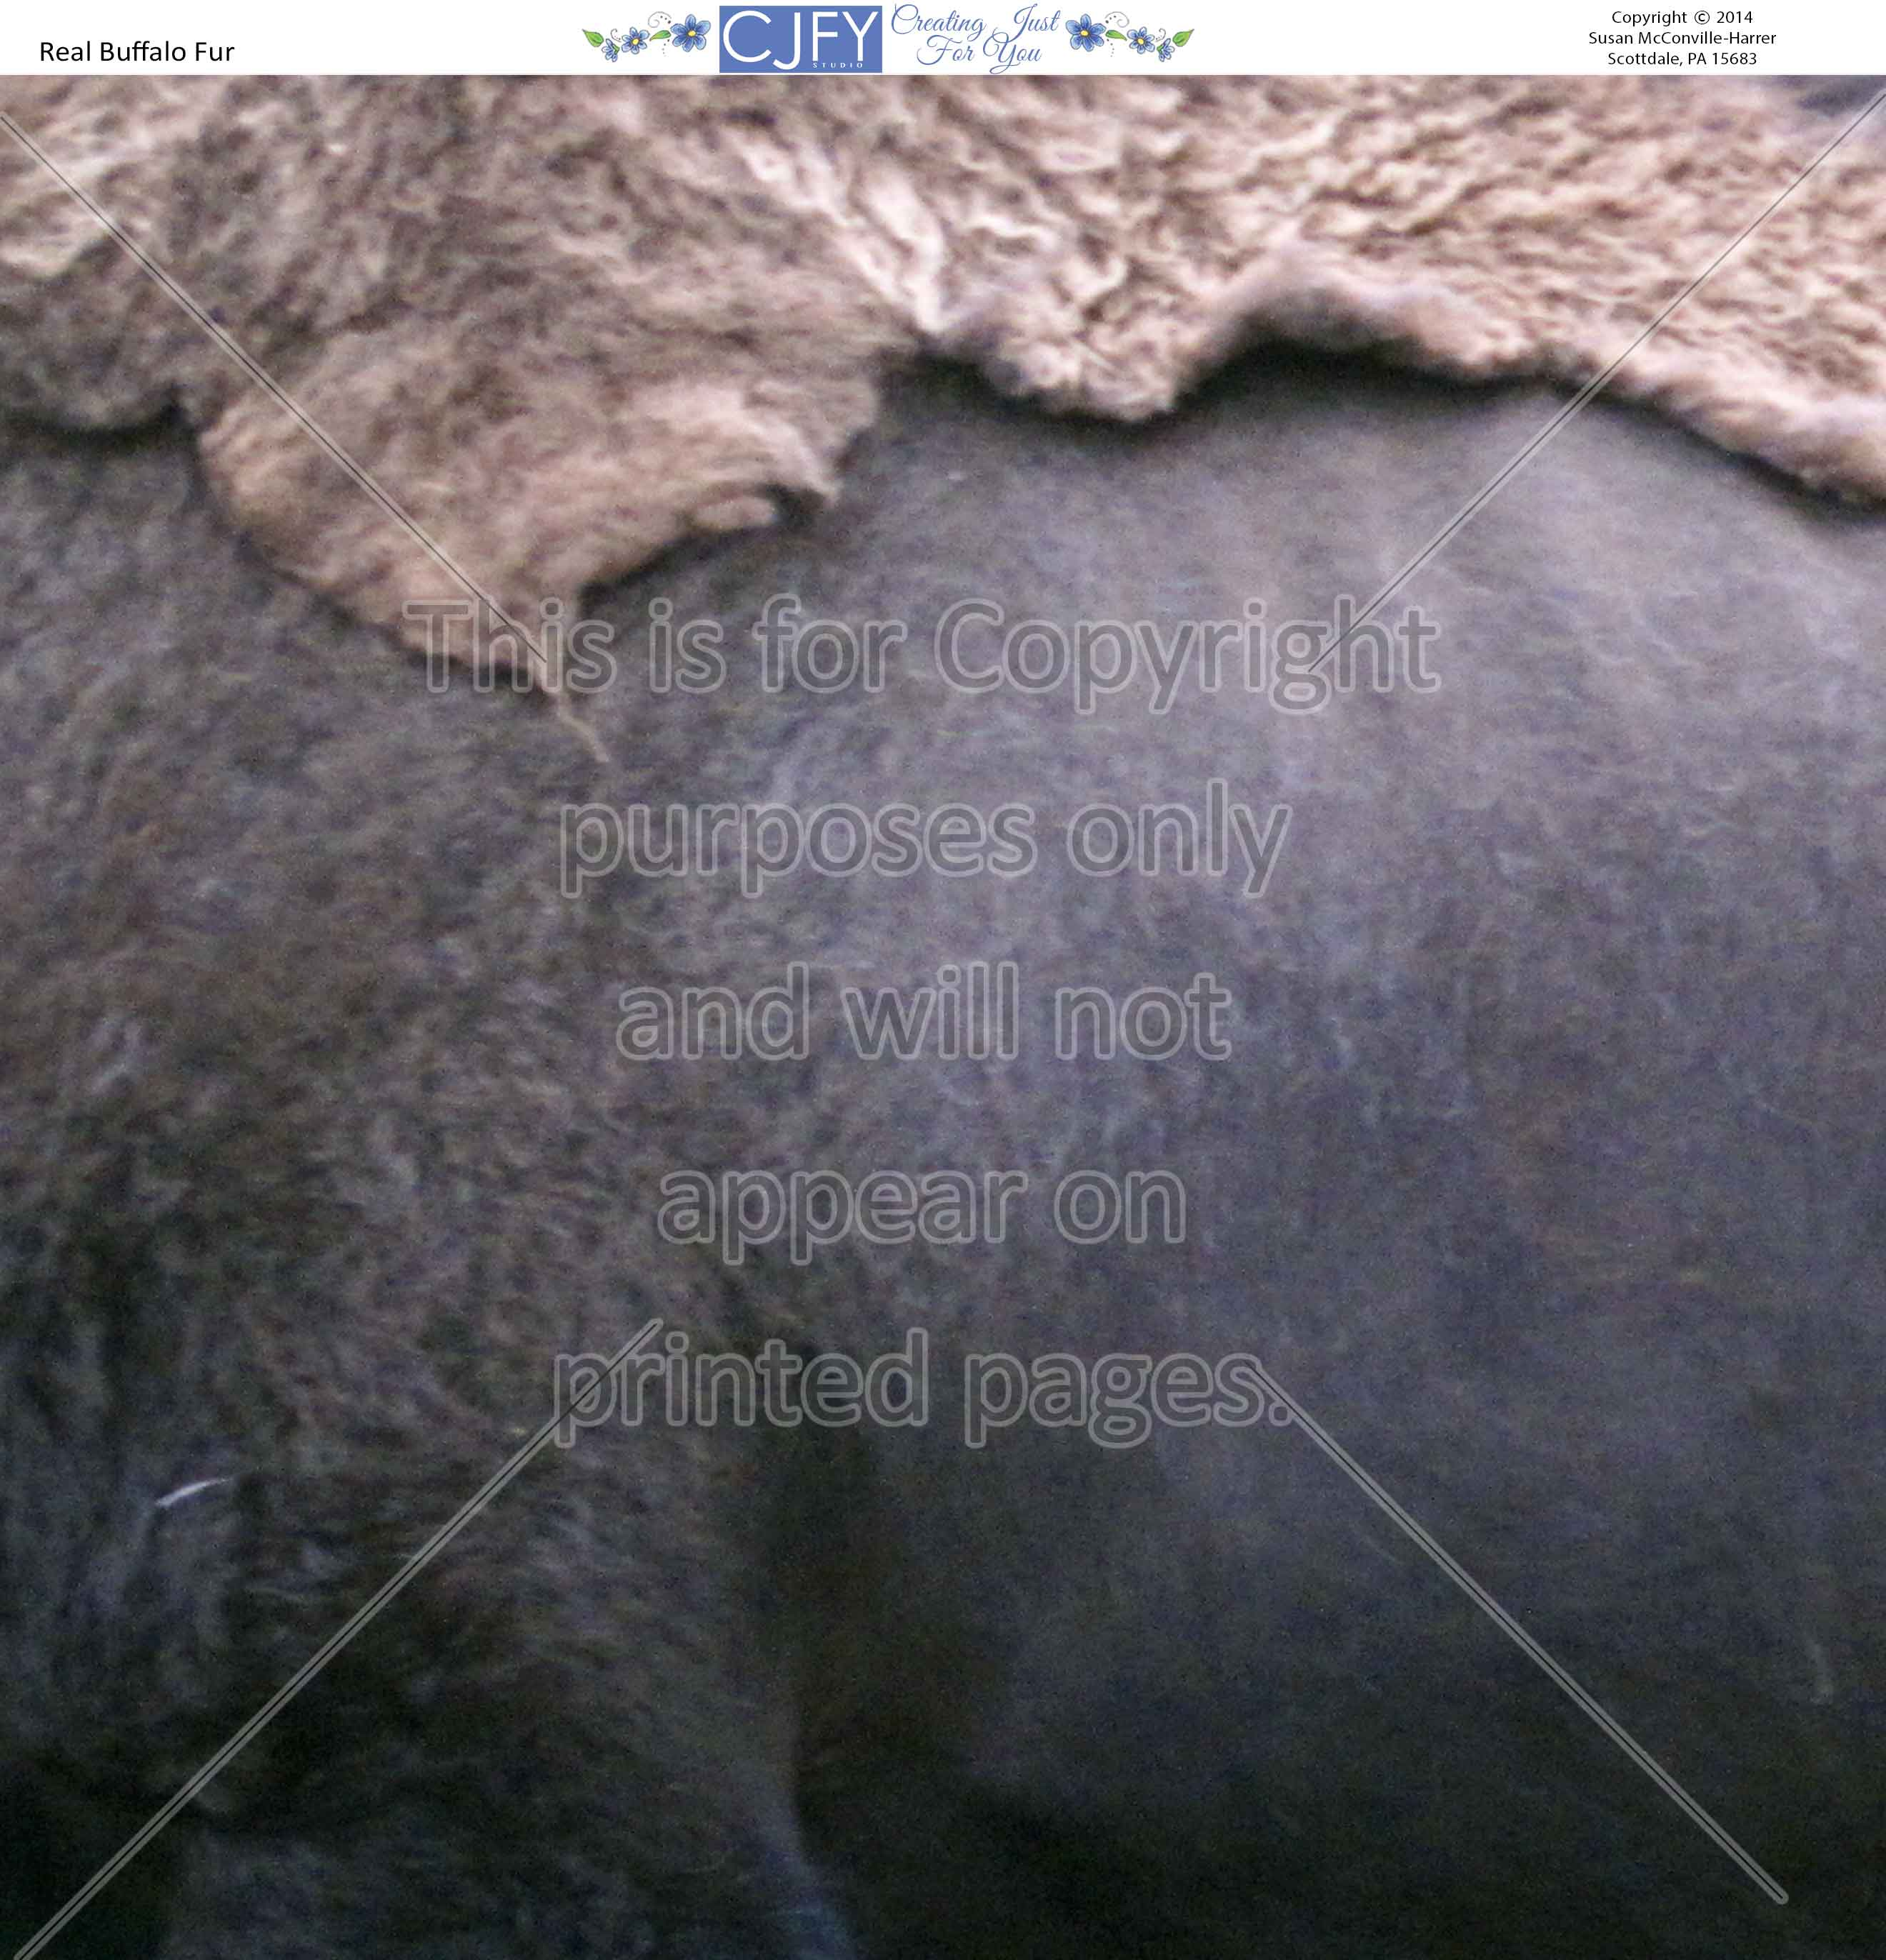 Scrapbook Paper, Animals,Buffalos